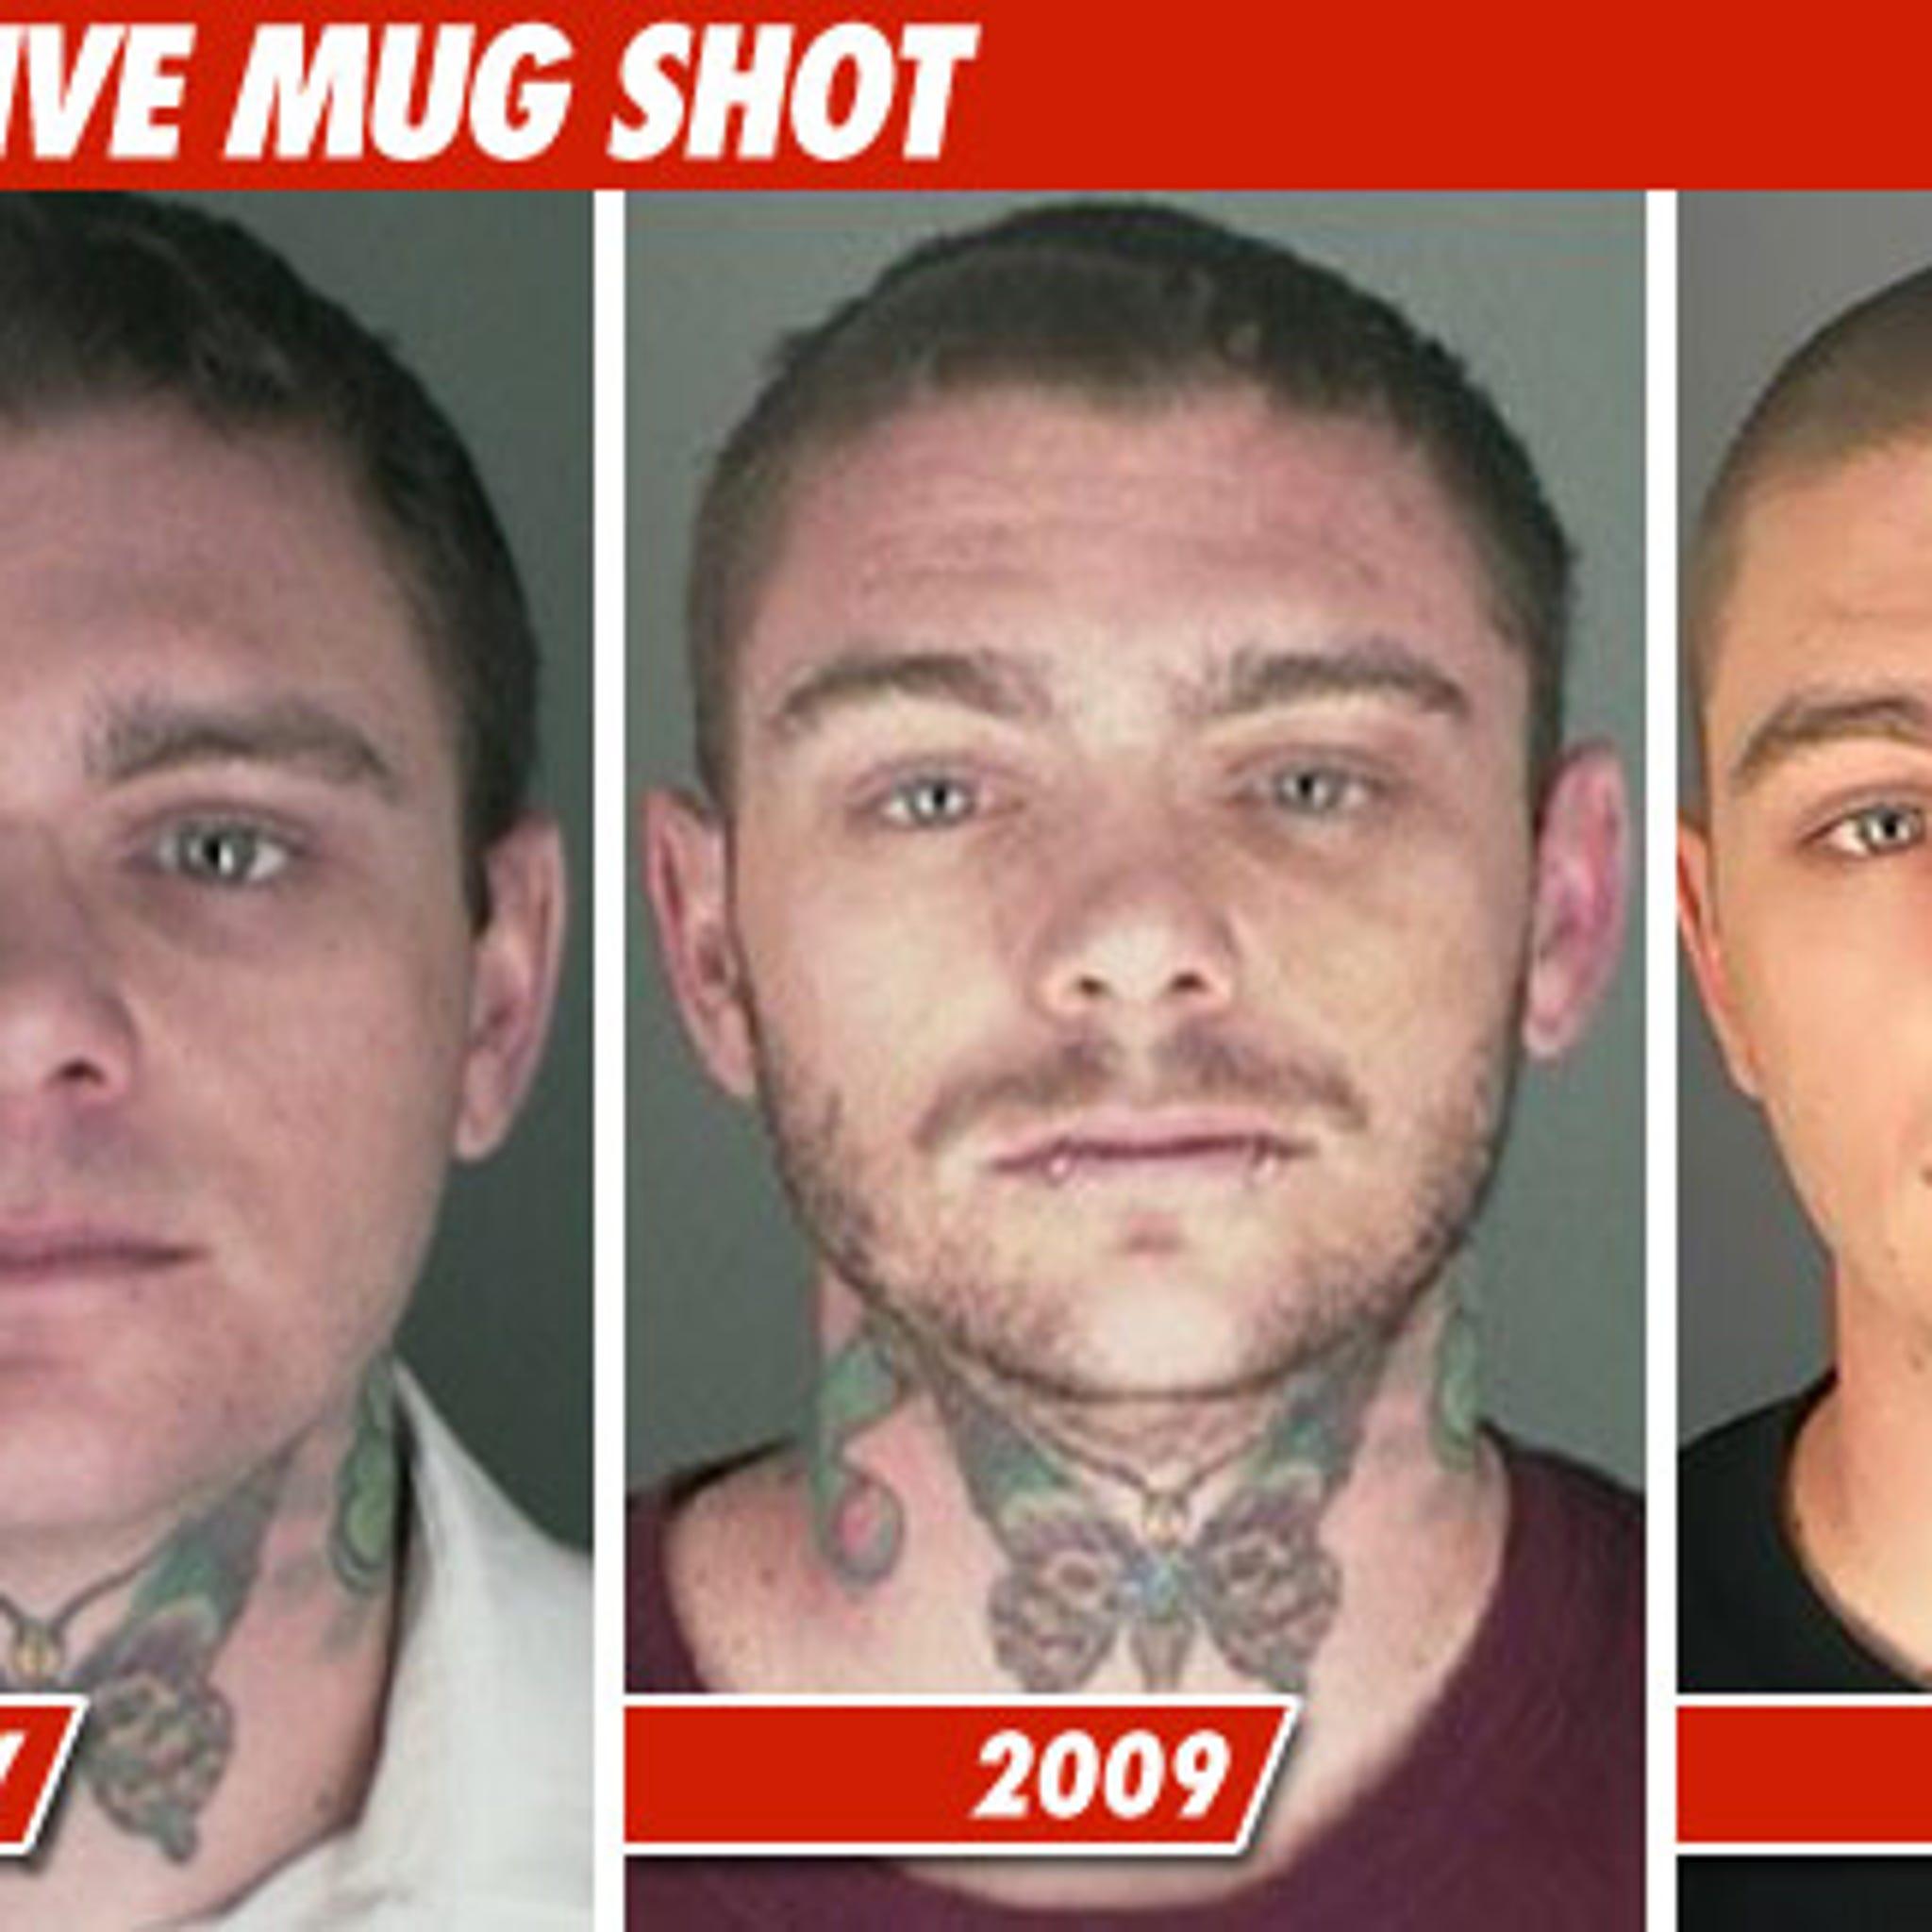 Family Ties' Kid -- New Mug Shot Lacks Luster